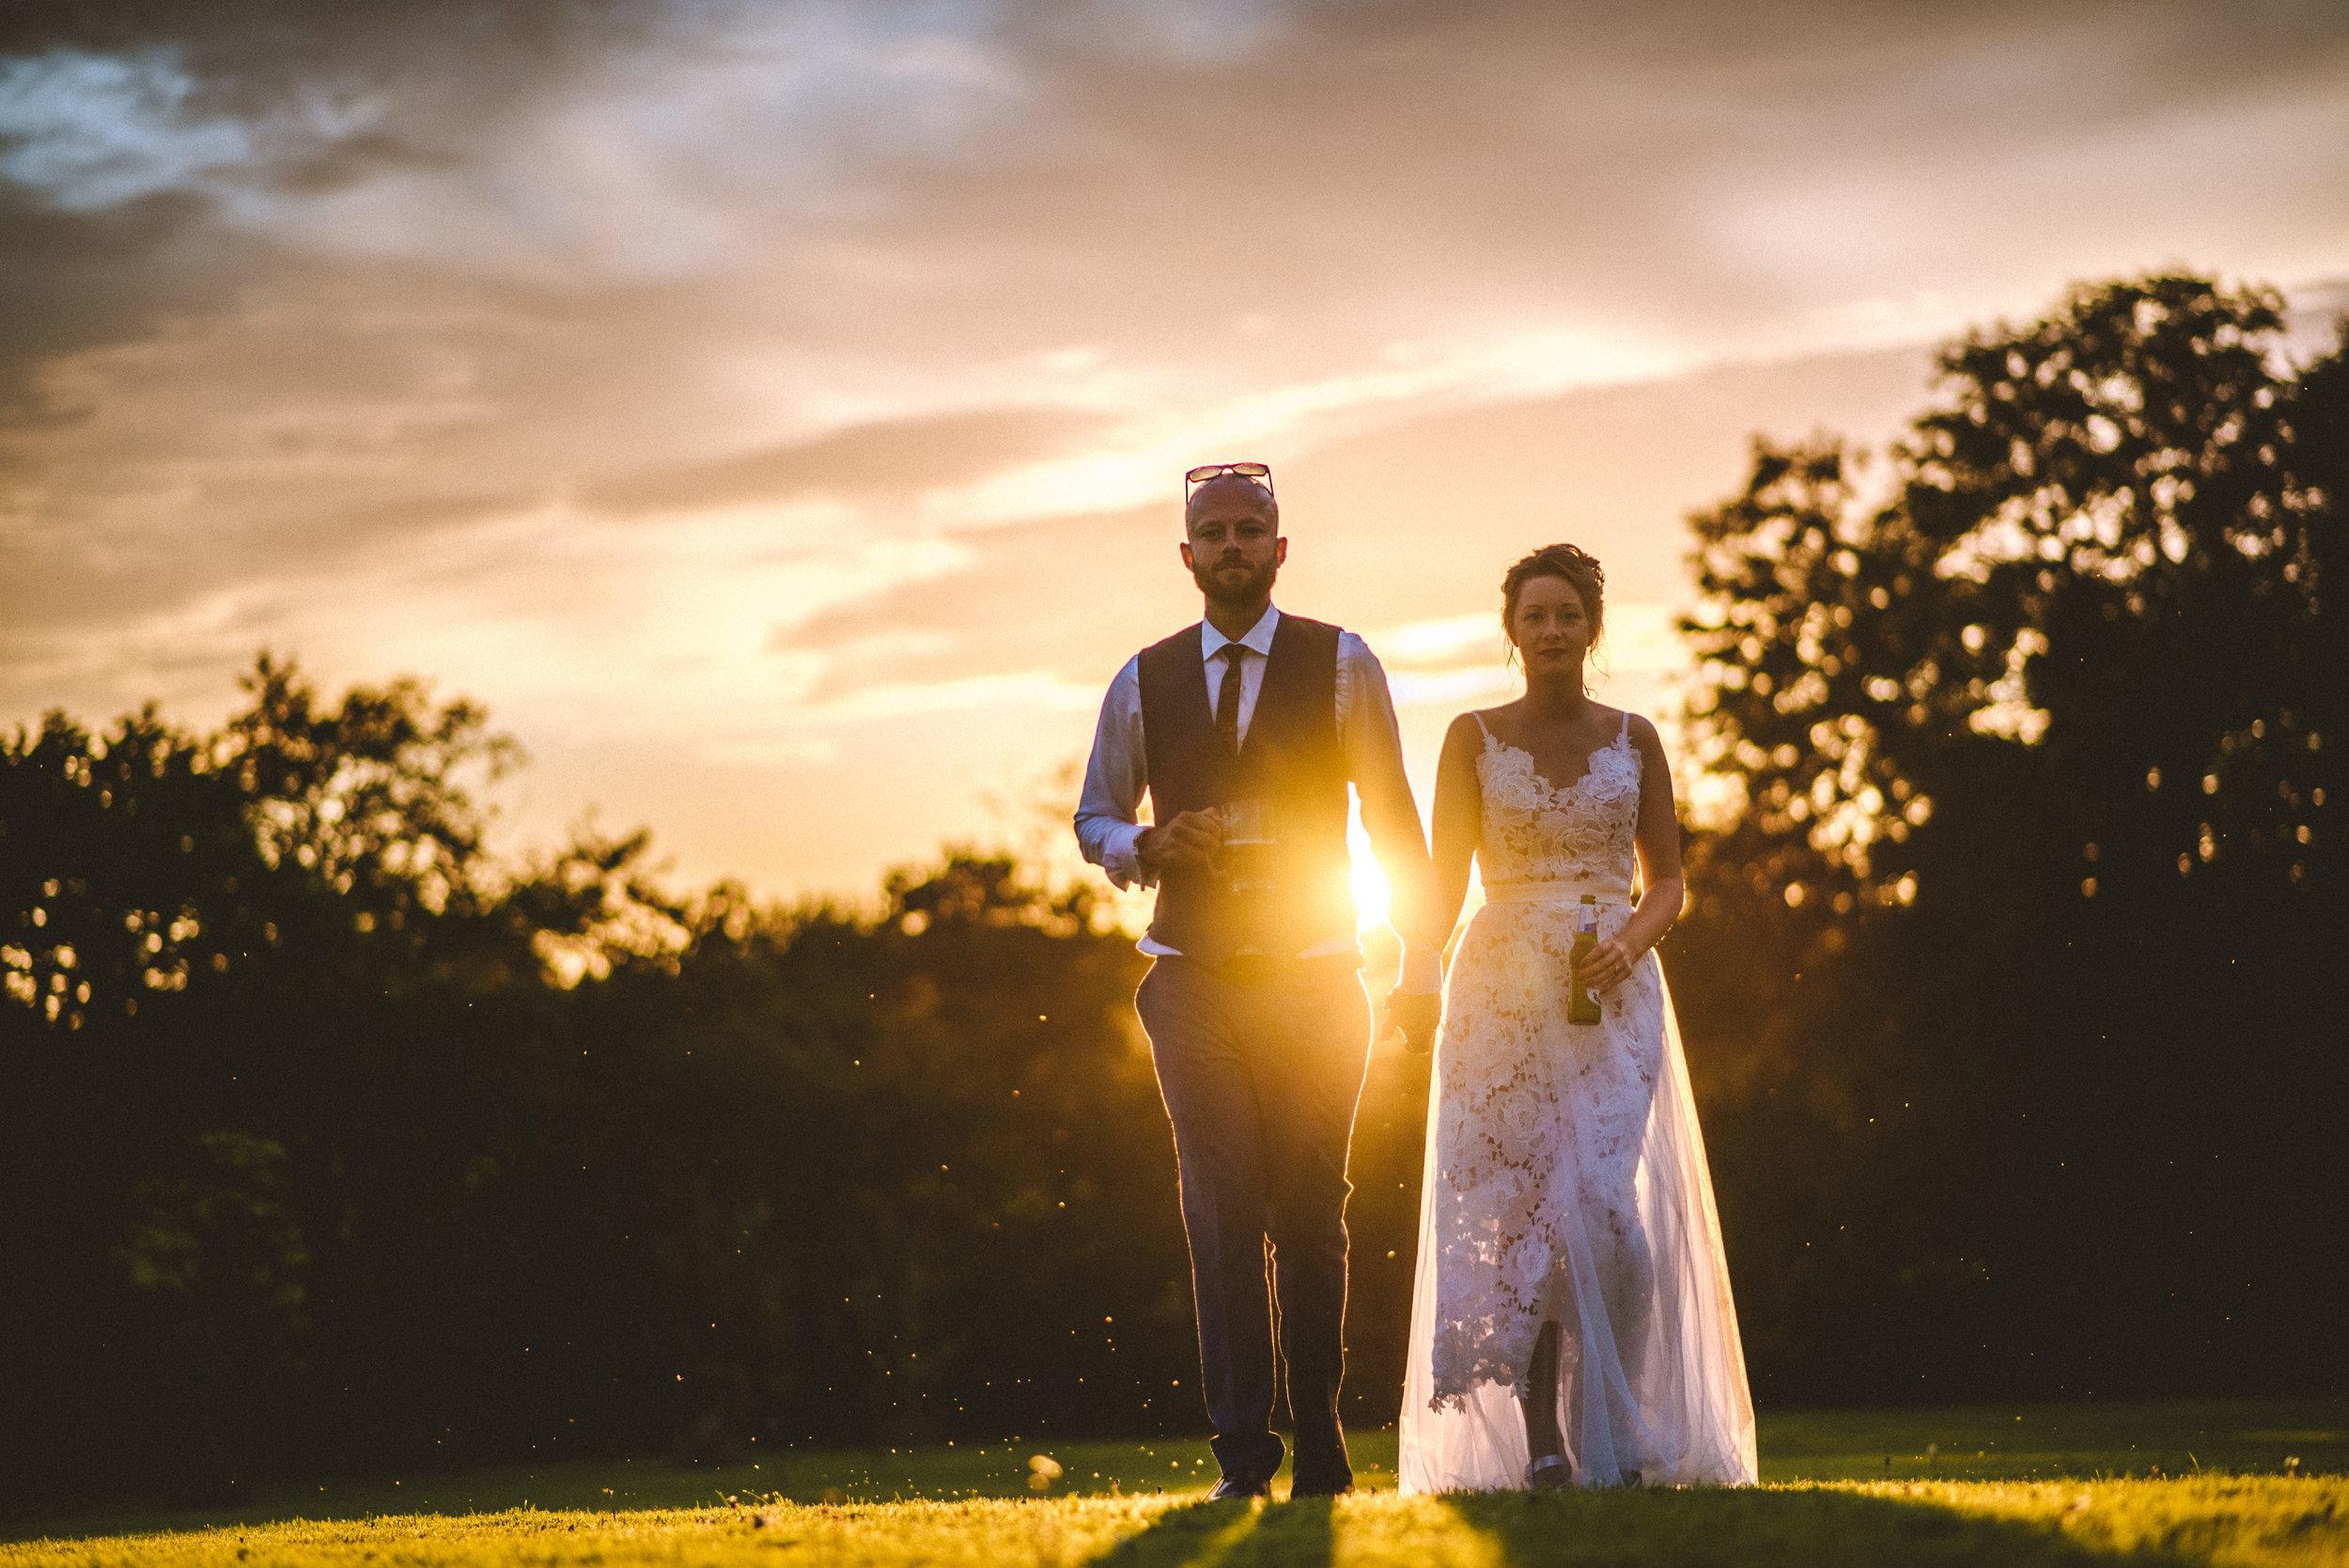 pencarrow-house-wedding-photographer-139.jpg